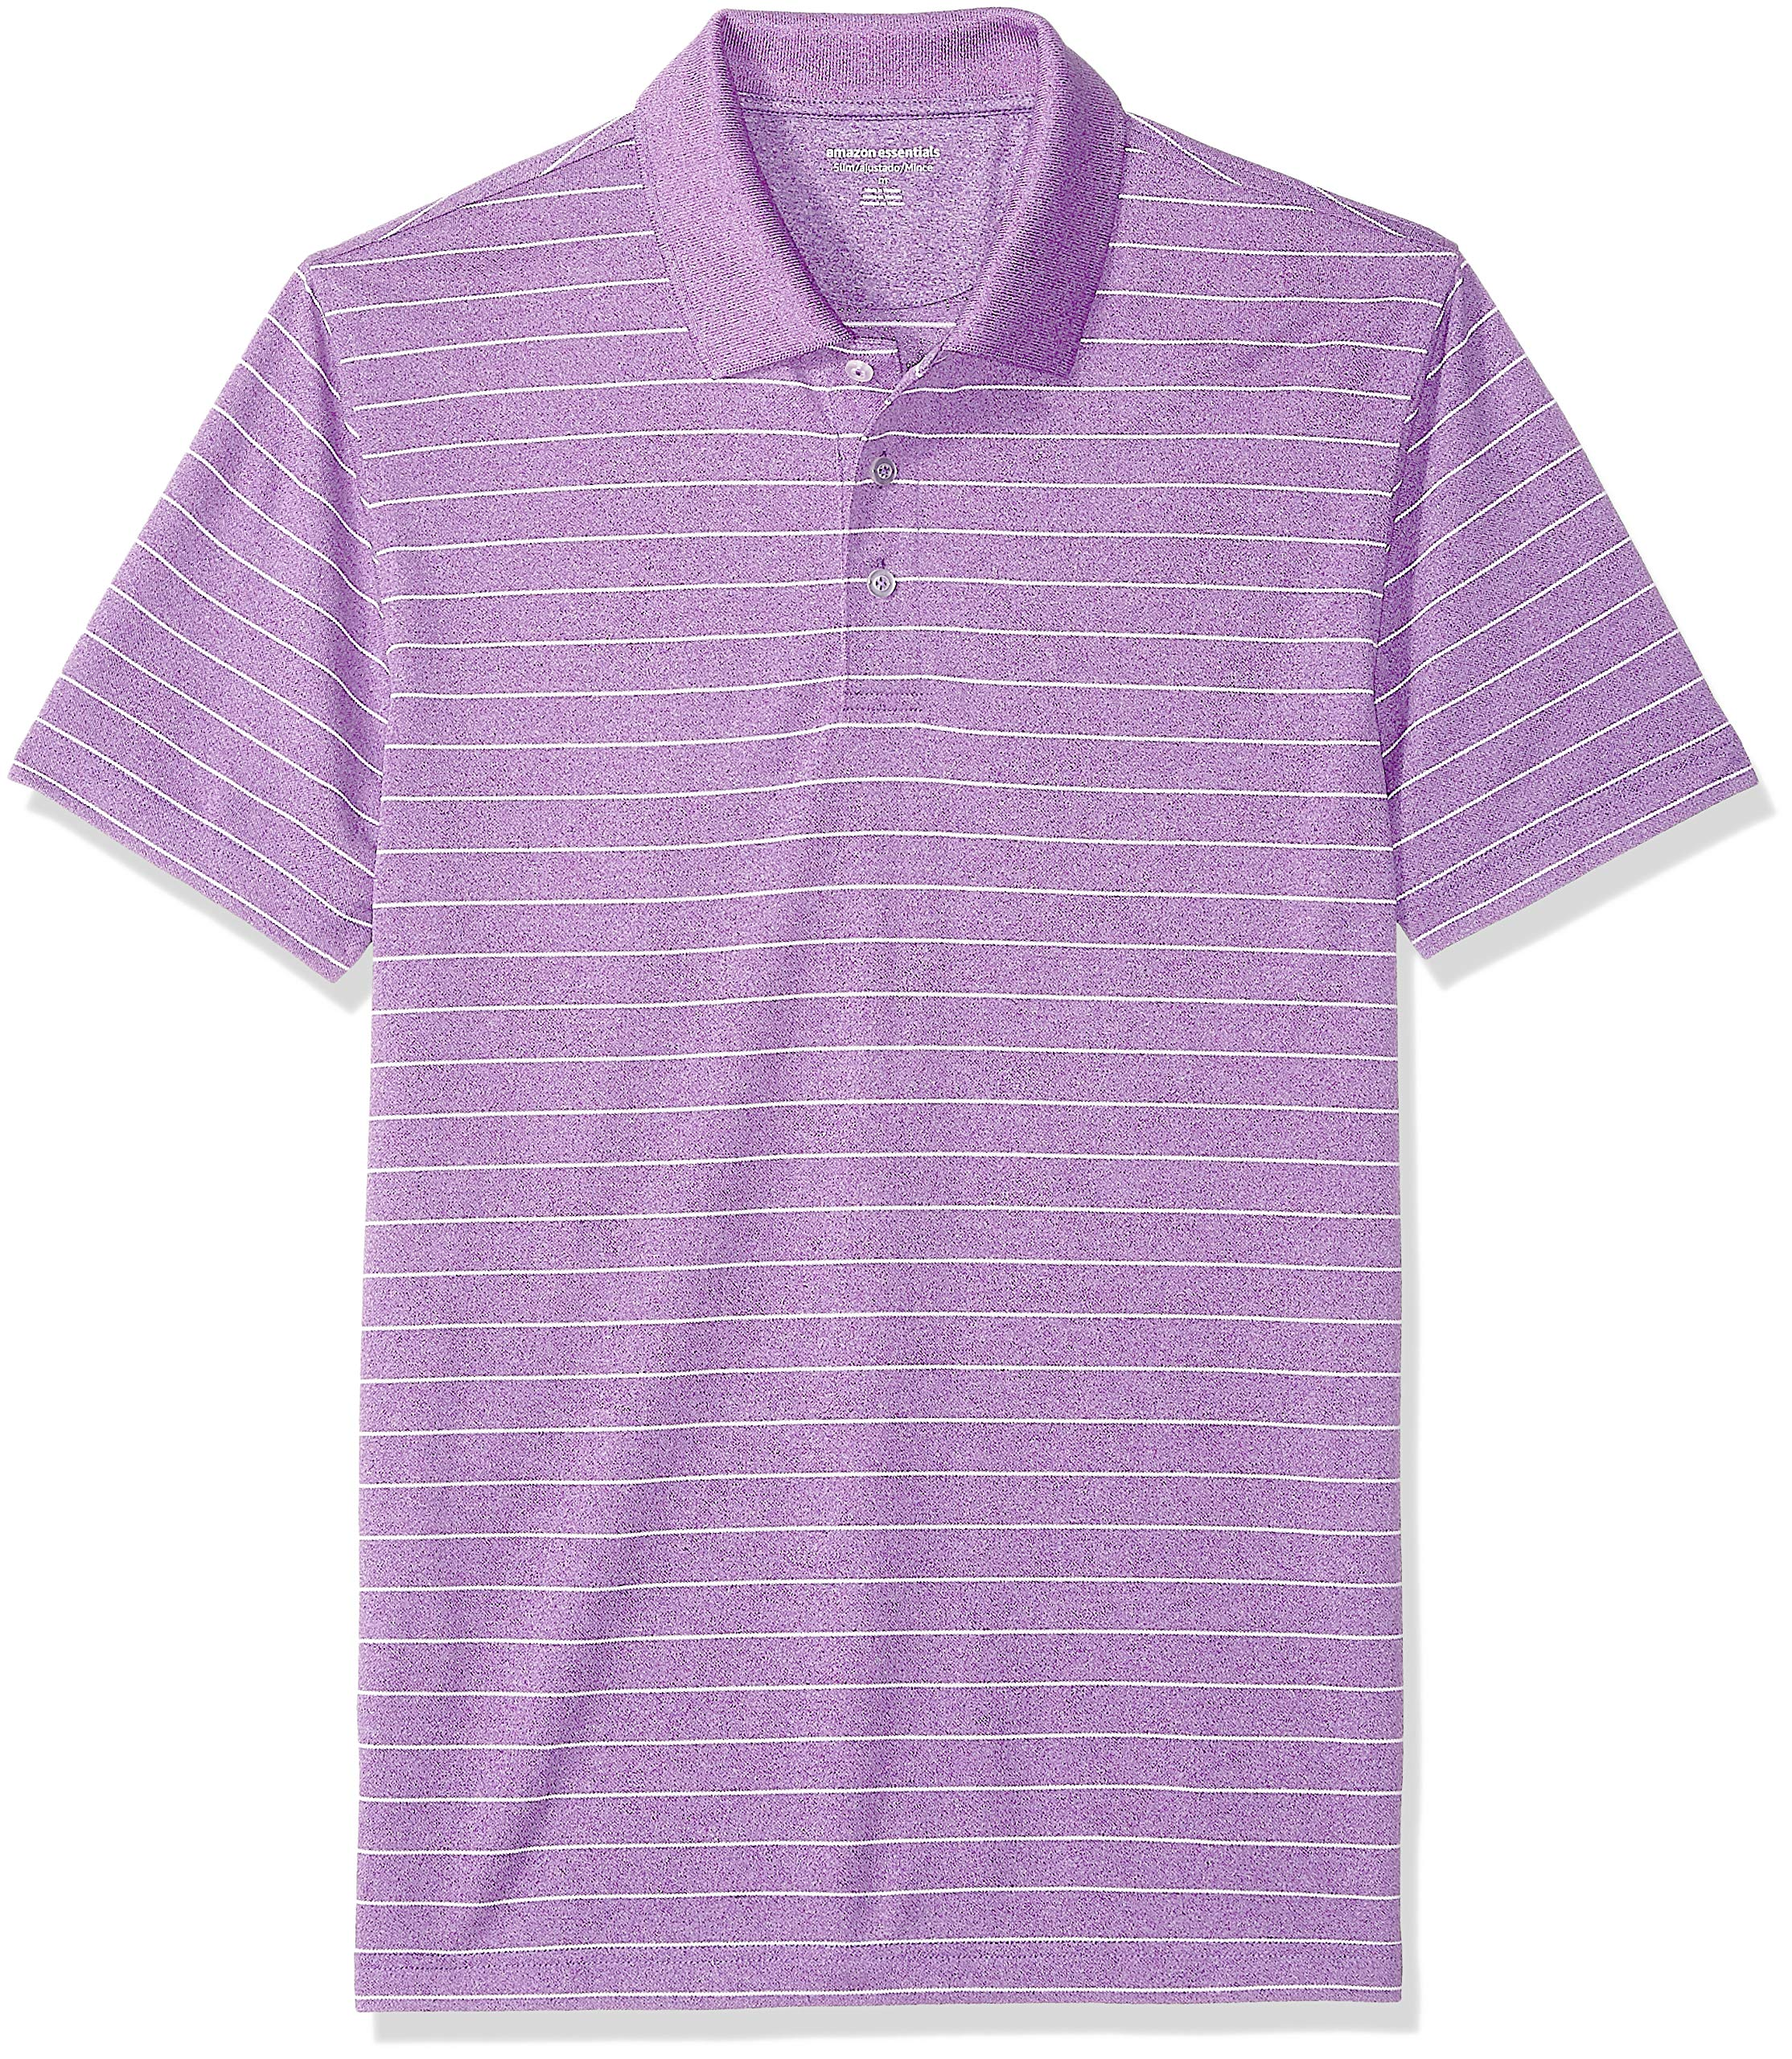 Amazon Essentials Men's Slim-Fit Quick-Dry Golf Polo Shirt, Purple Stripe, X-Small